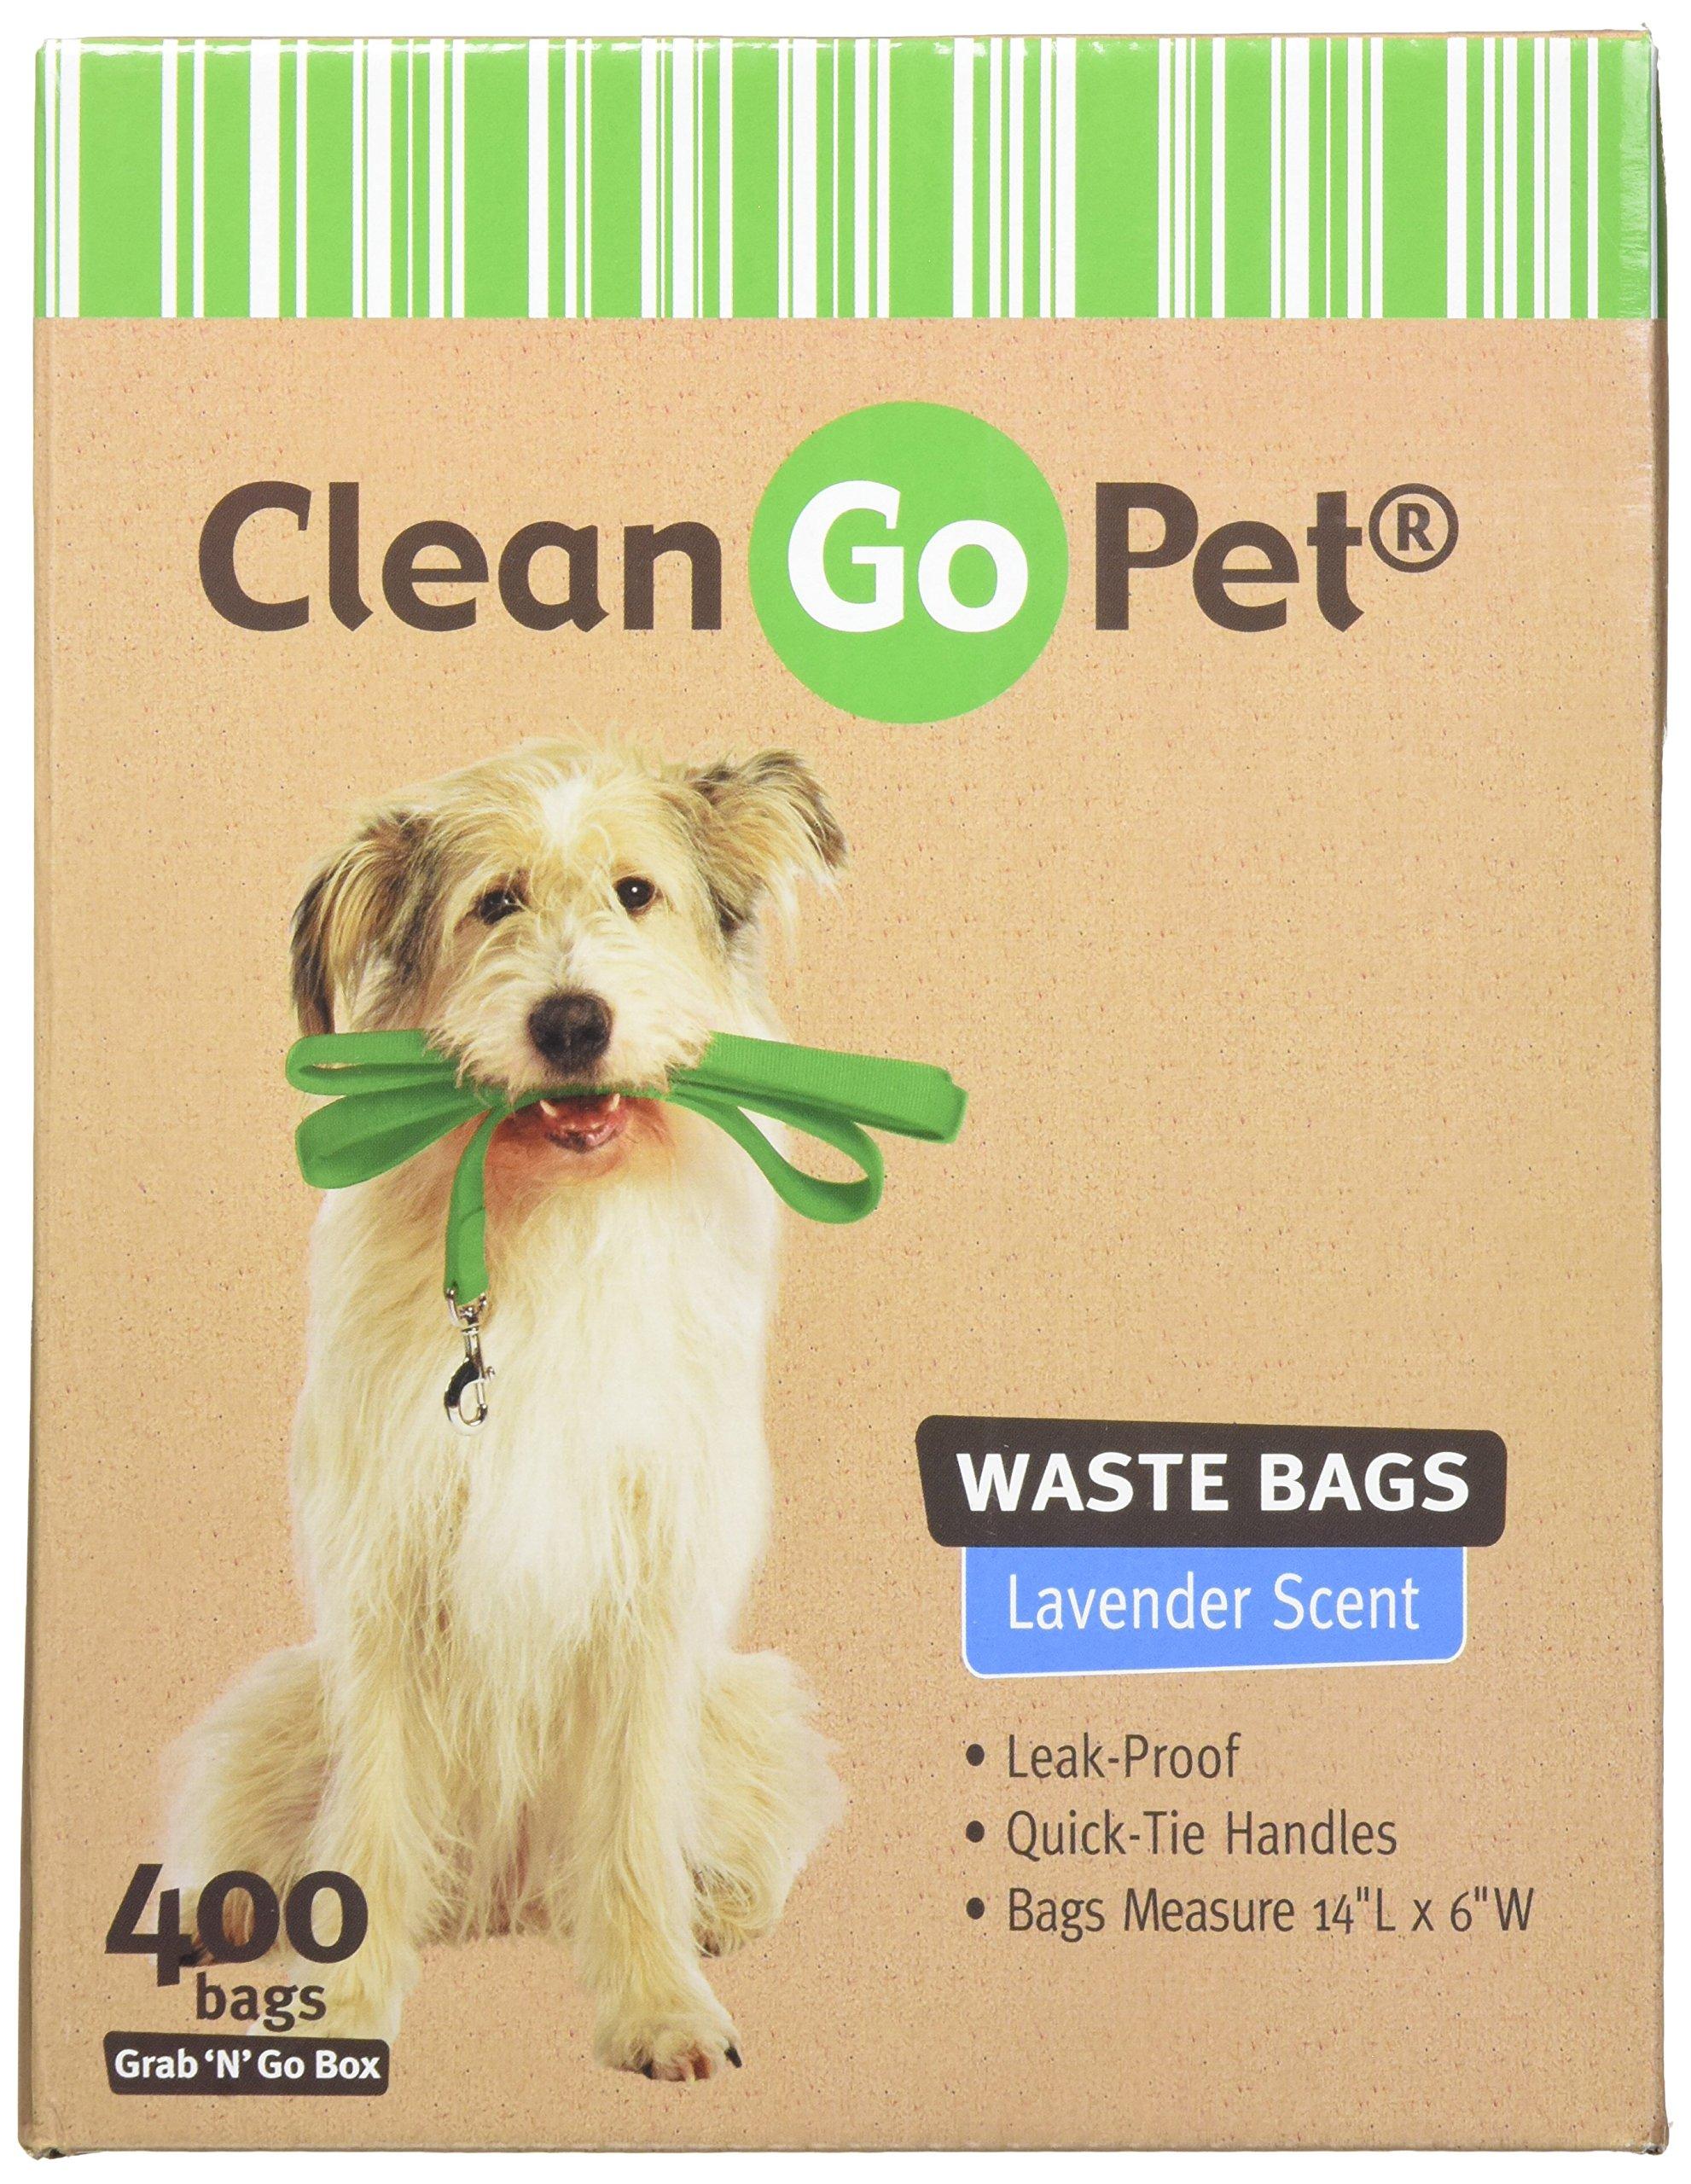 Clean Go Pet Lavender Scent Doggy Waste Bags, 400-Count, Quick-Tie Handles Poop Bags